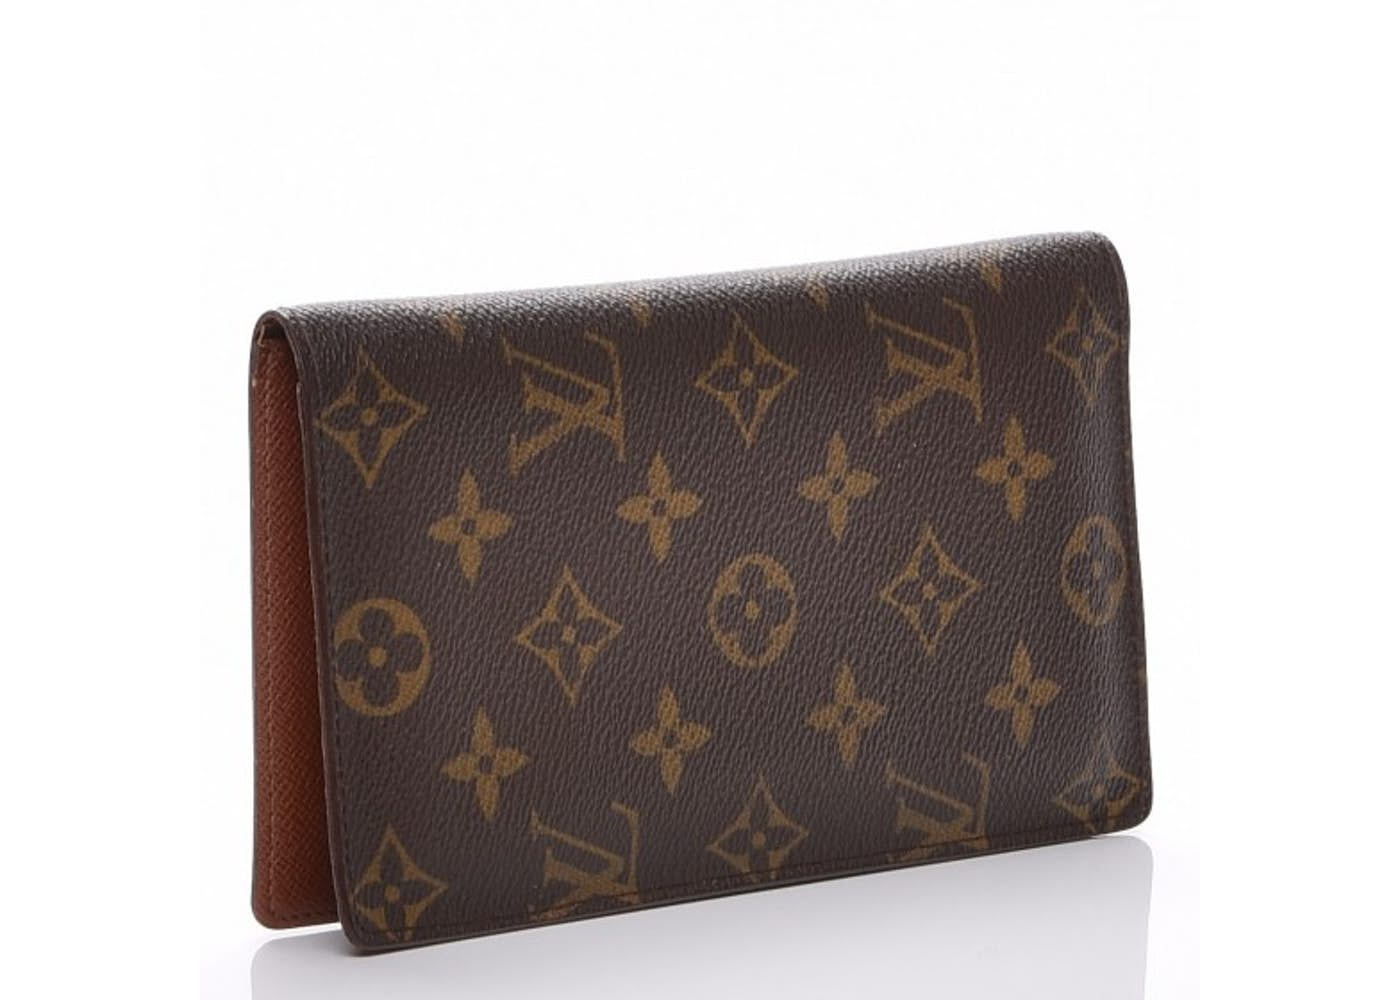 Louis vuitton checkbook wallet porte chequier cartes credit european monogram brown - Porte chequier louis vuitton ...